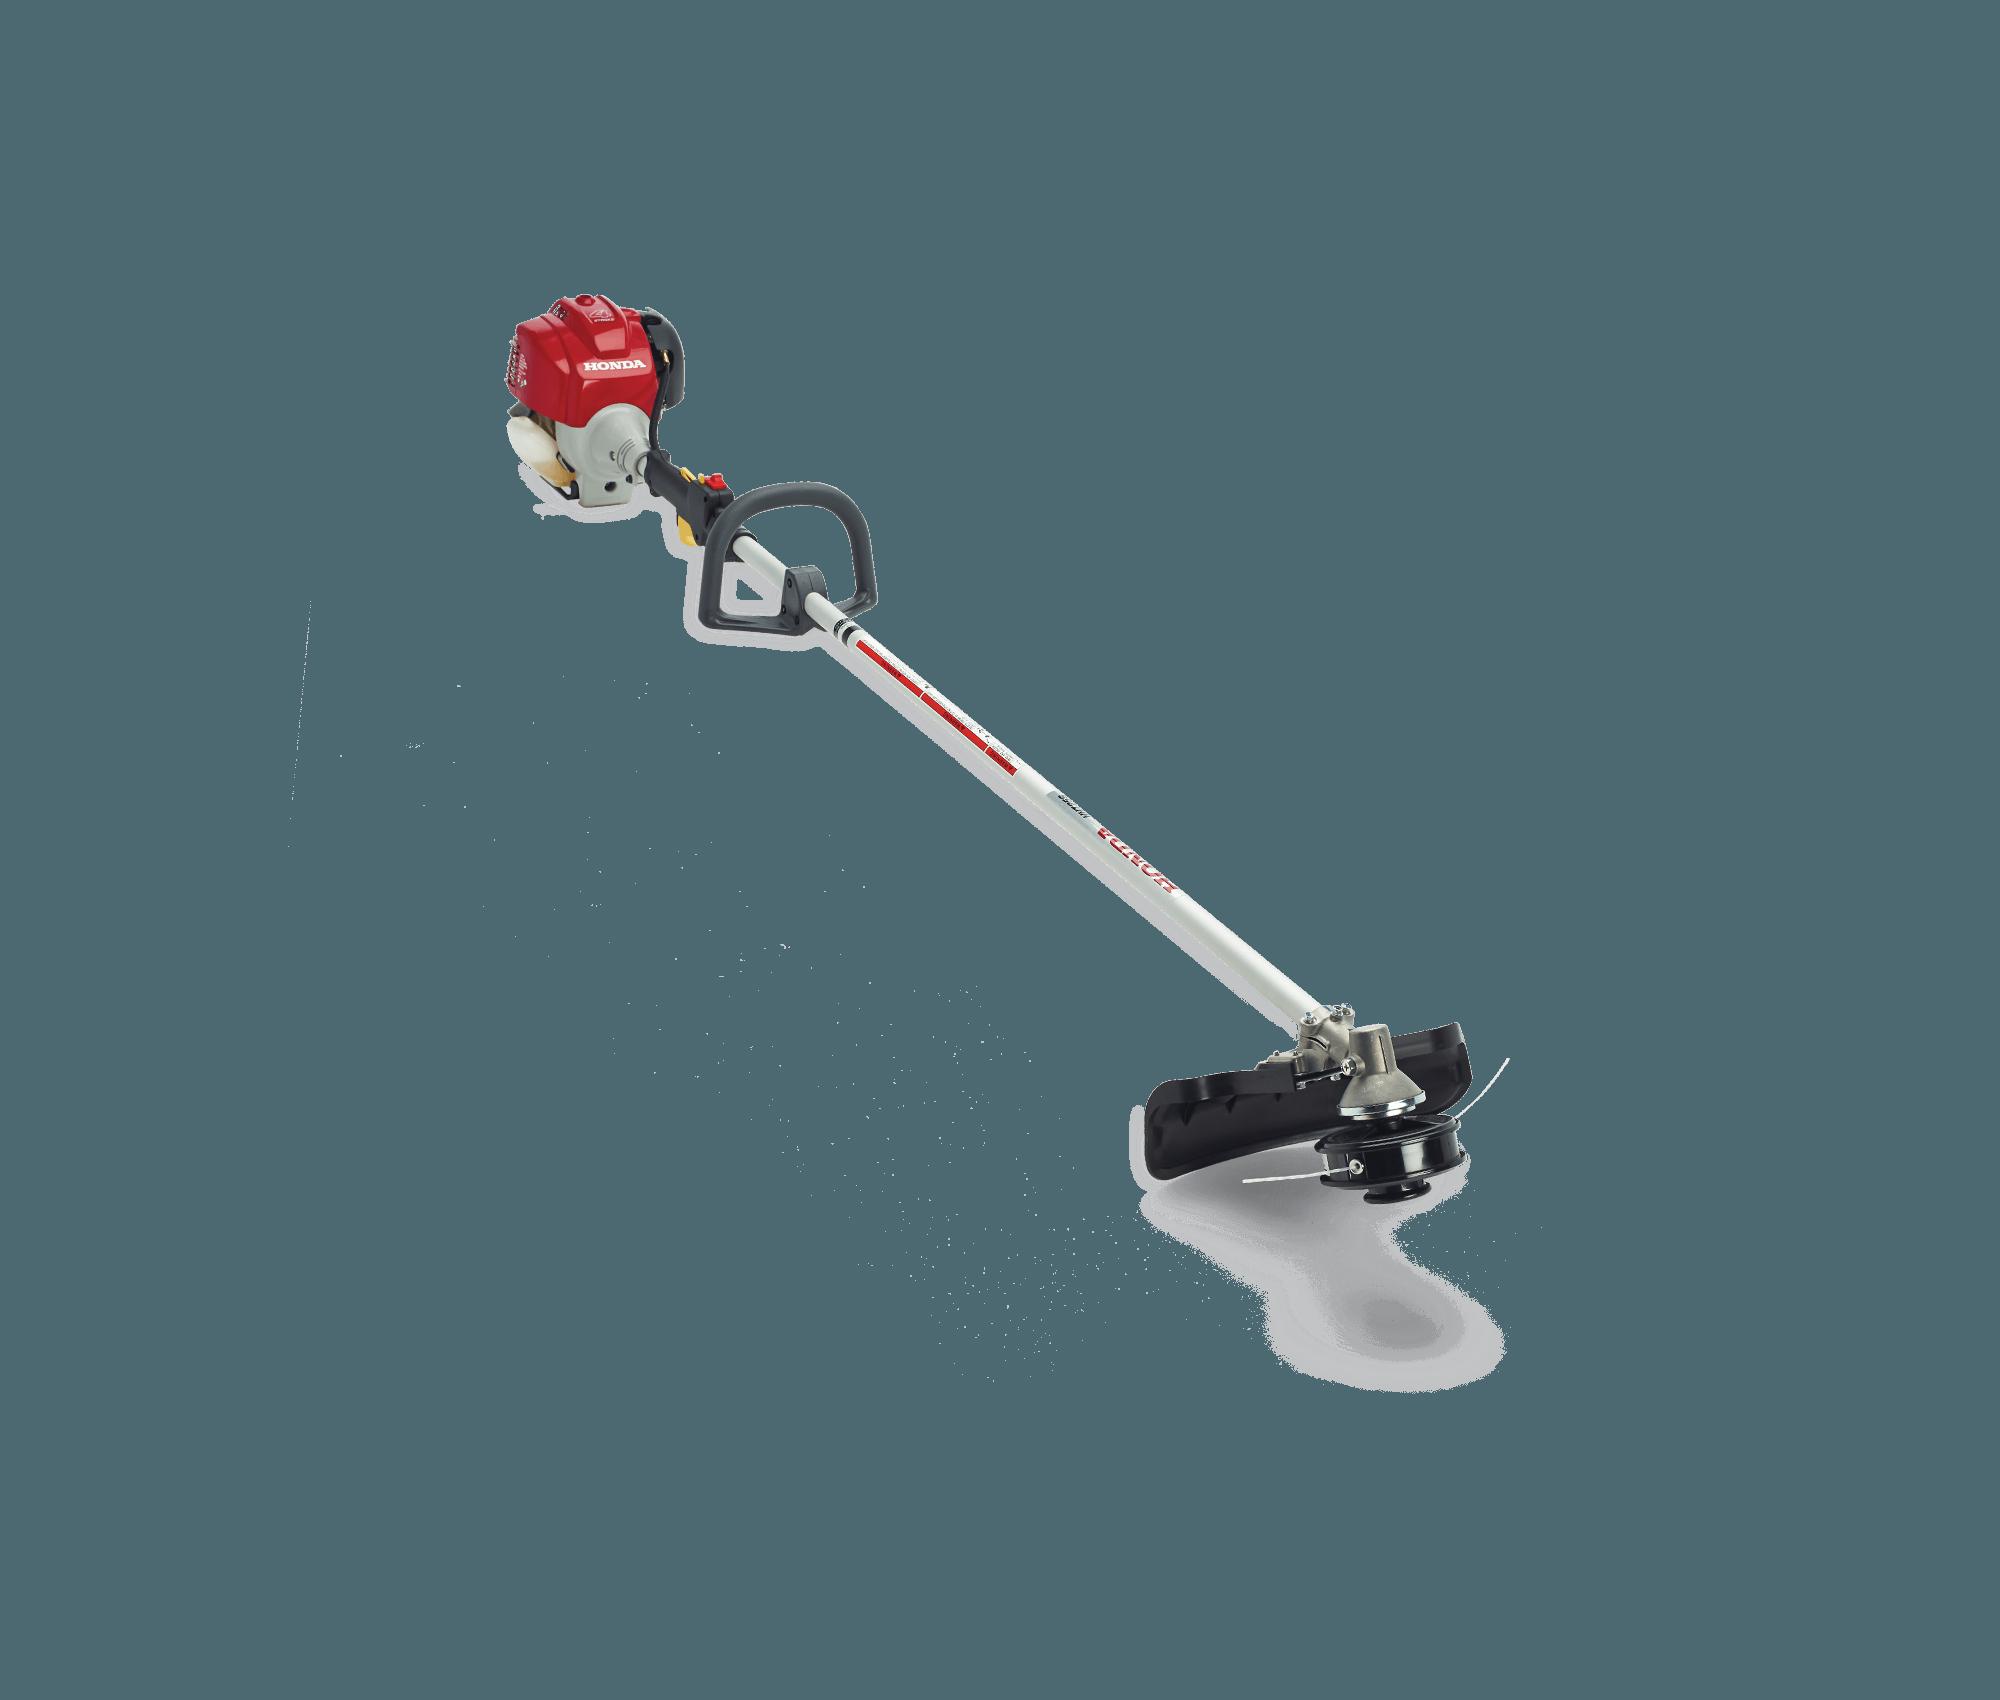 Honda HHT25SL Handheld Trimmer